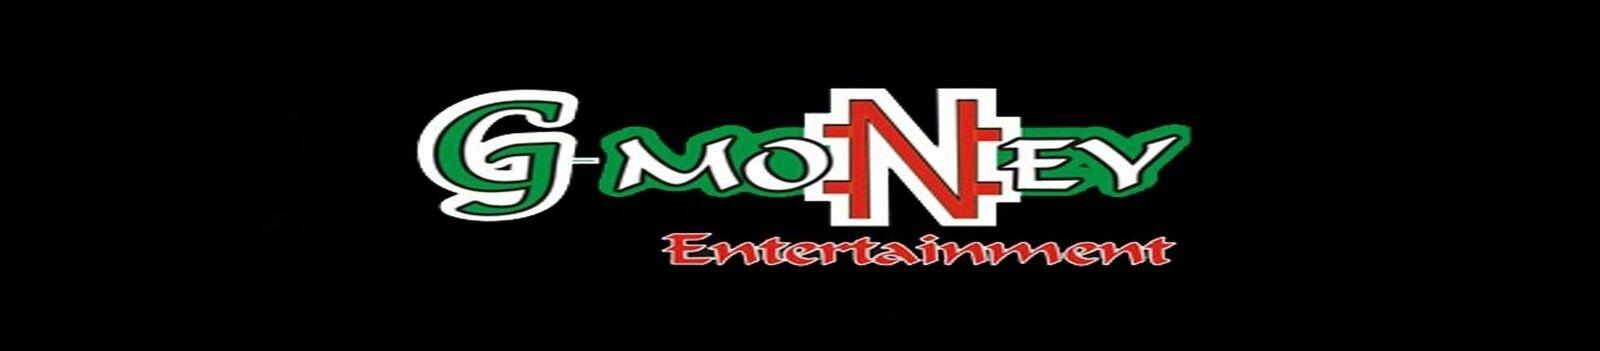 G-Money2k9 Ent/Inc.